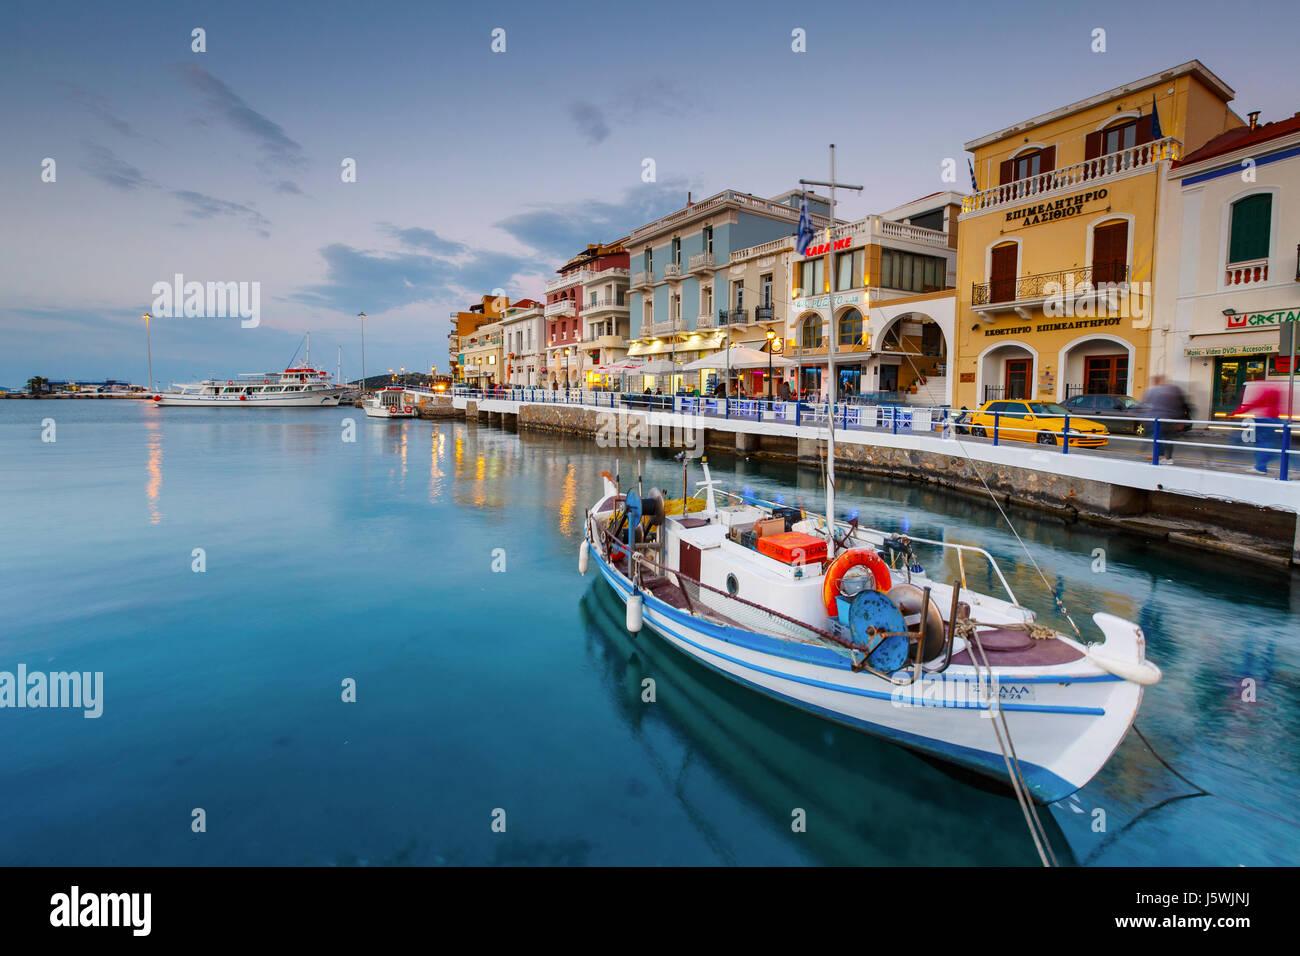 Evening view of Agios Nikolaos and its harbor, Crete, Greece. - Stock Image